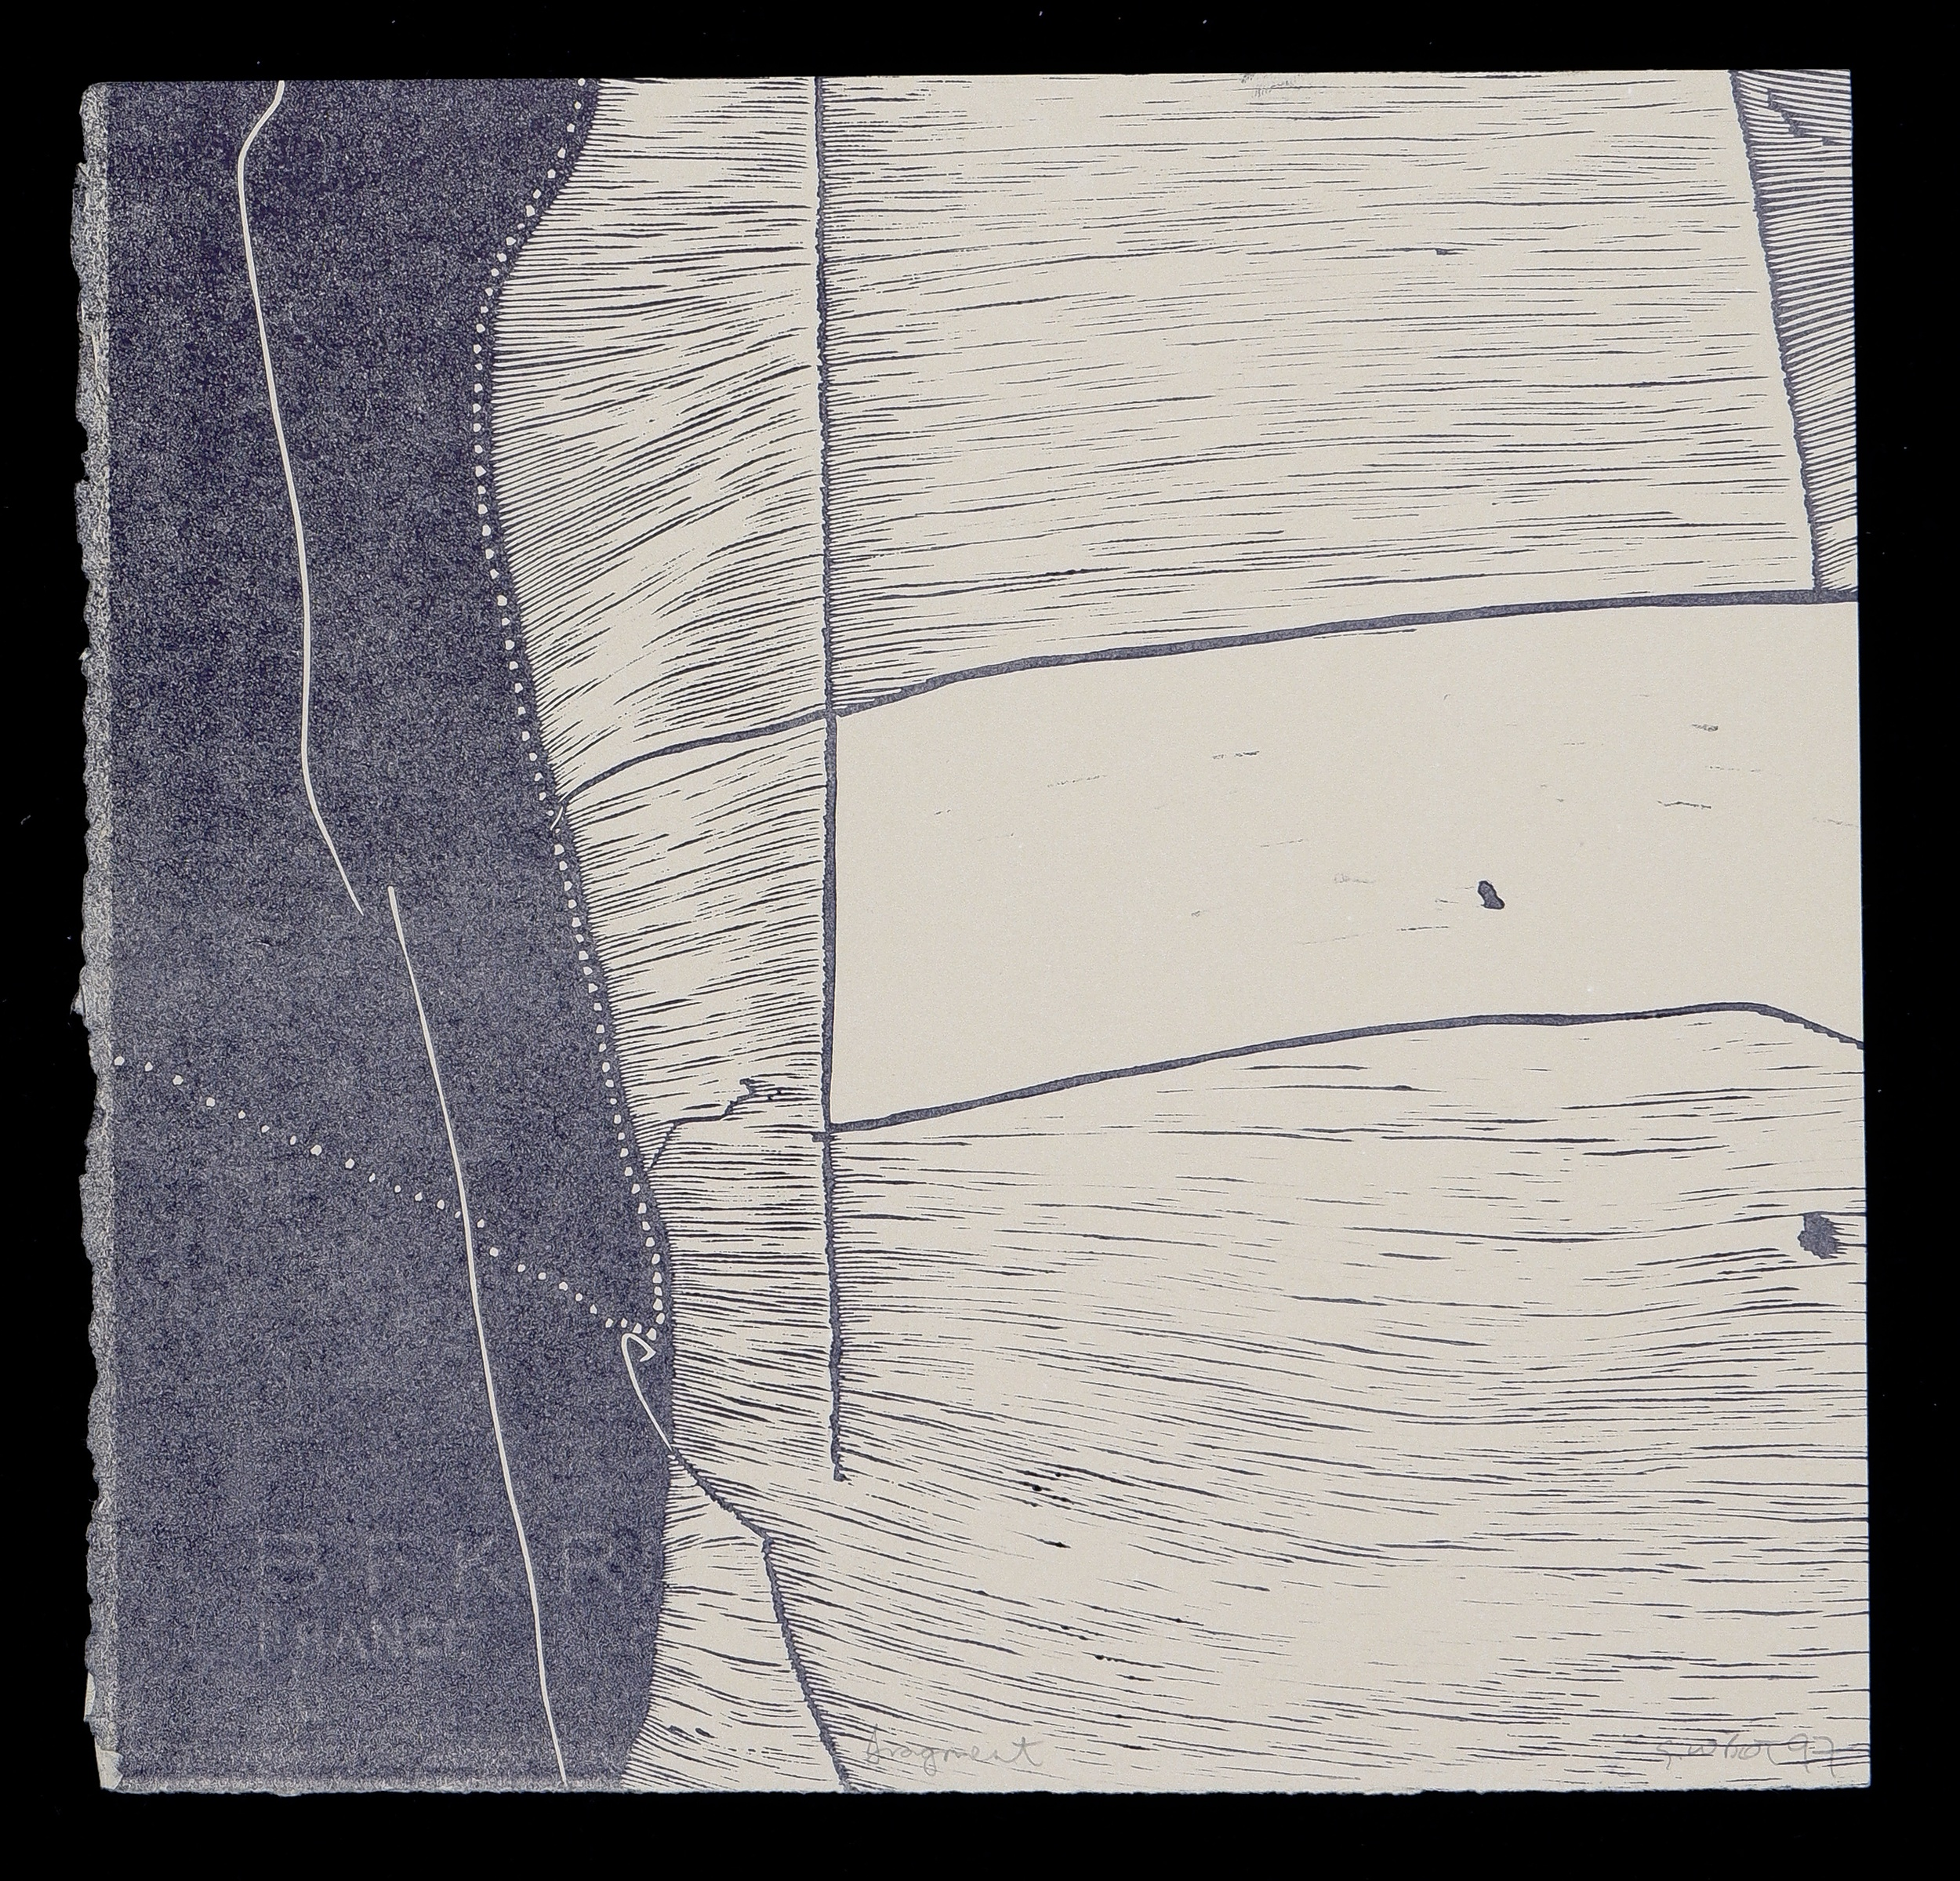 'G. W. Bot (born 1954), Fragment 1997, Linocut, 27 x 28 cm (image size)'